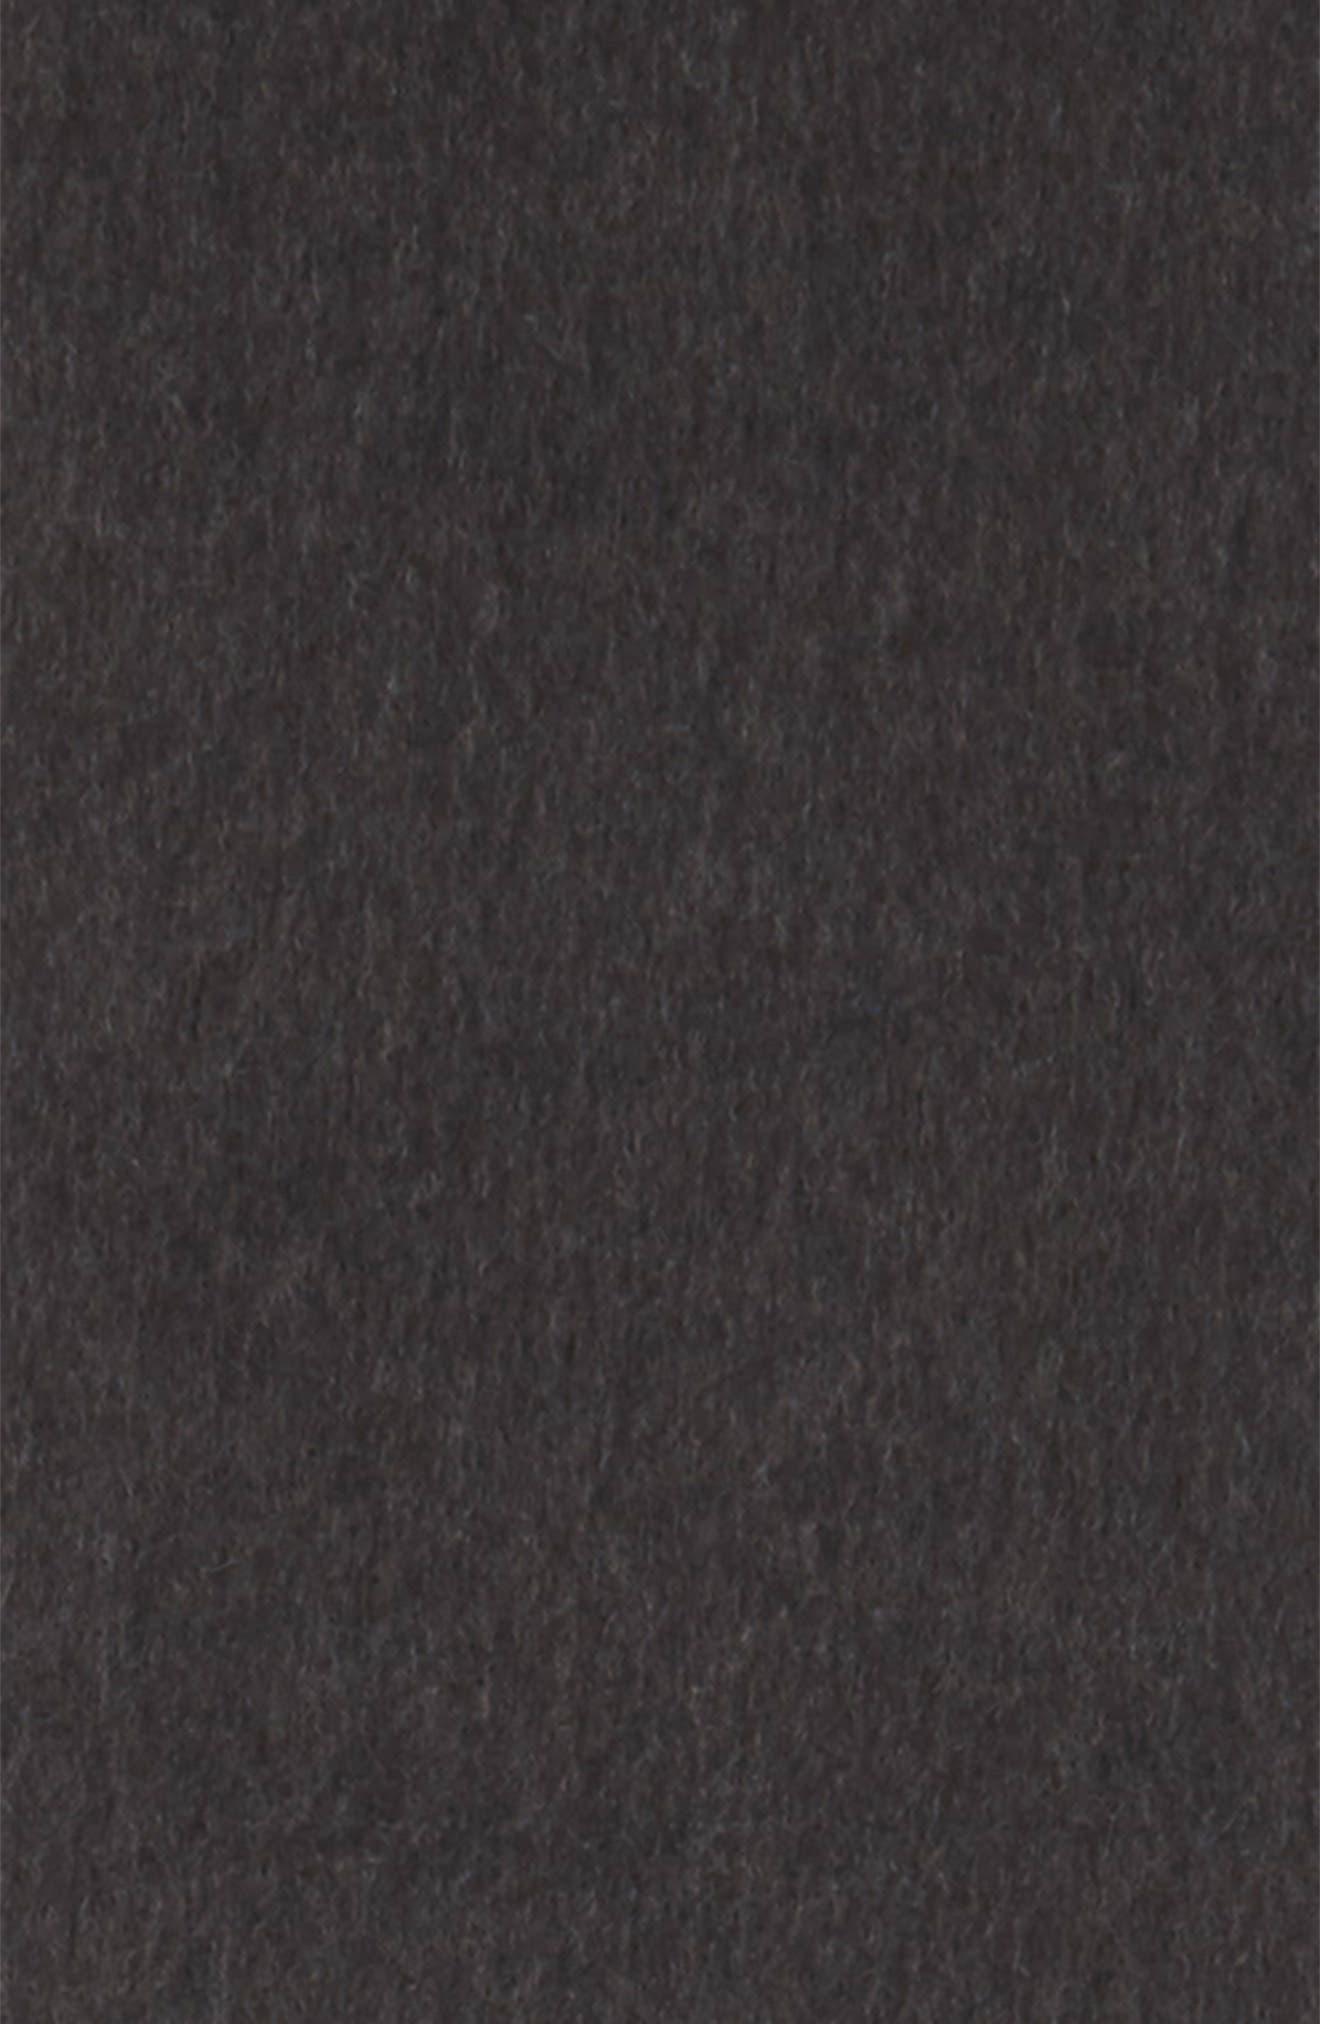 Alternate Image 3  - Nordstrom Men's Shop Lambswool Scarf